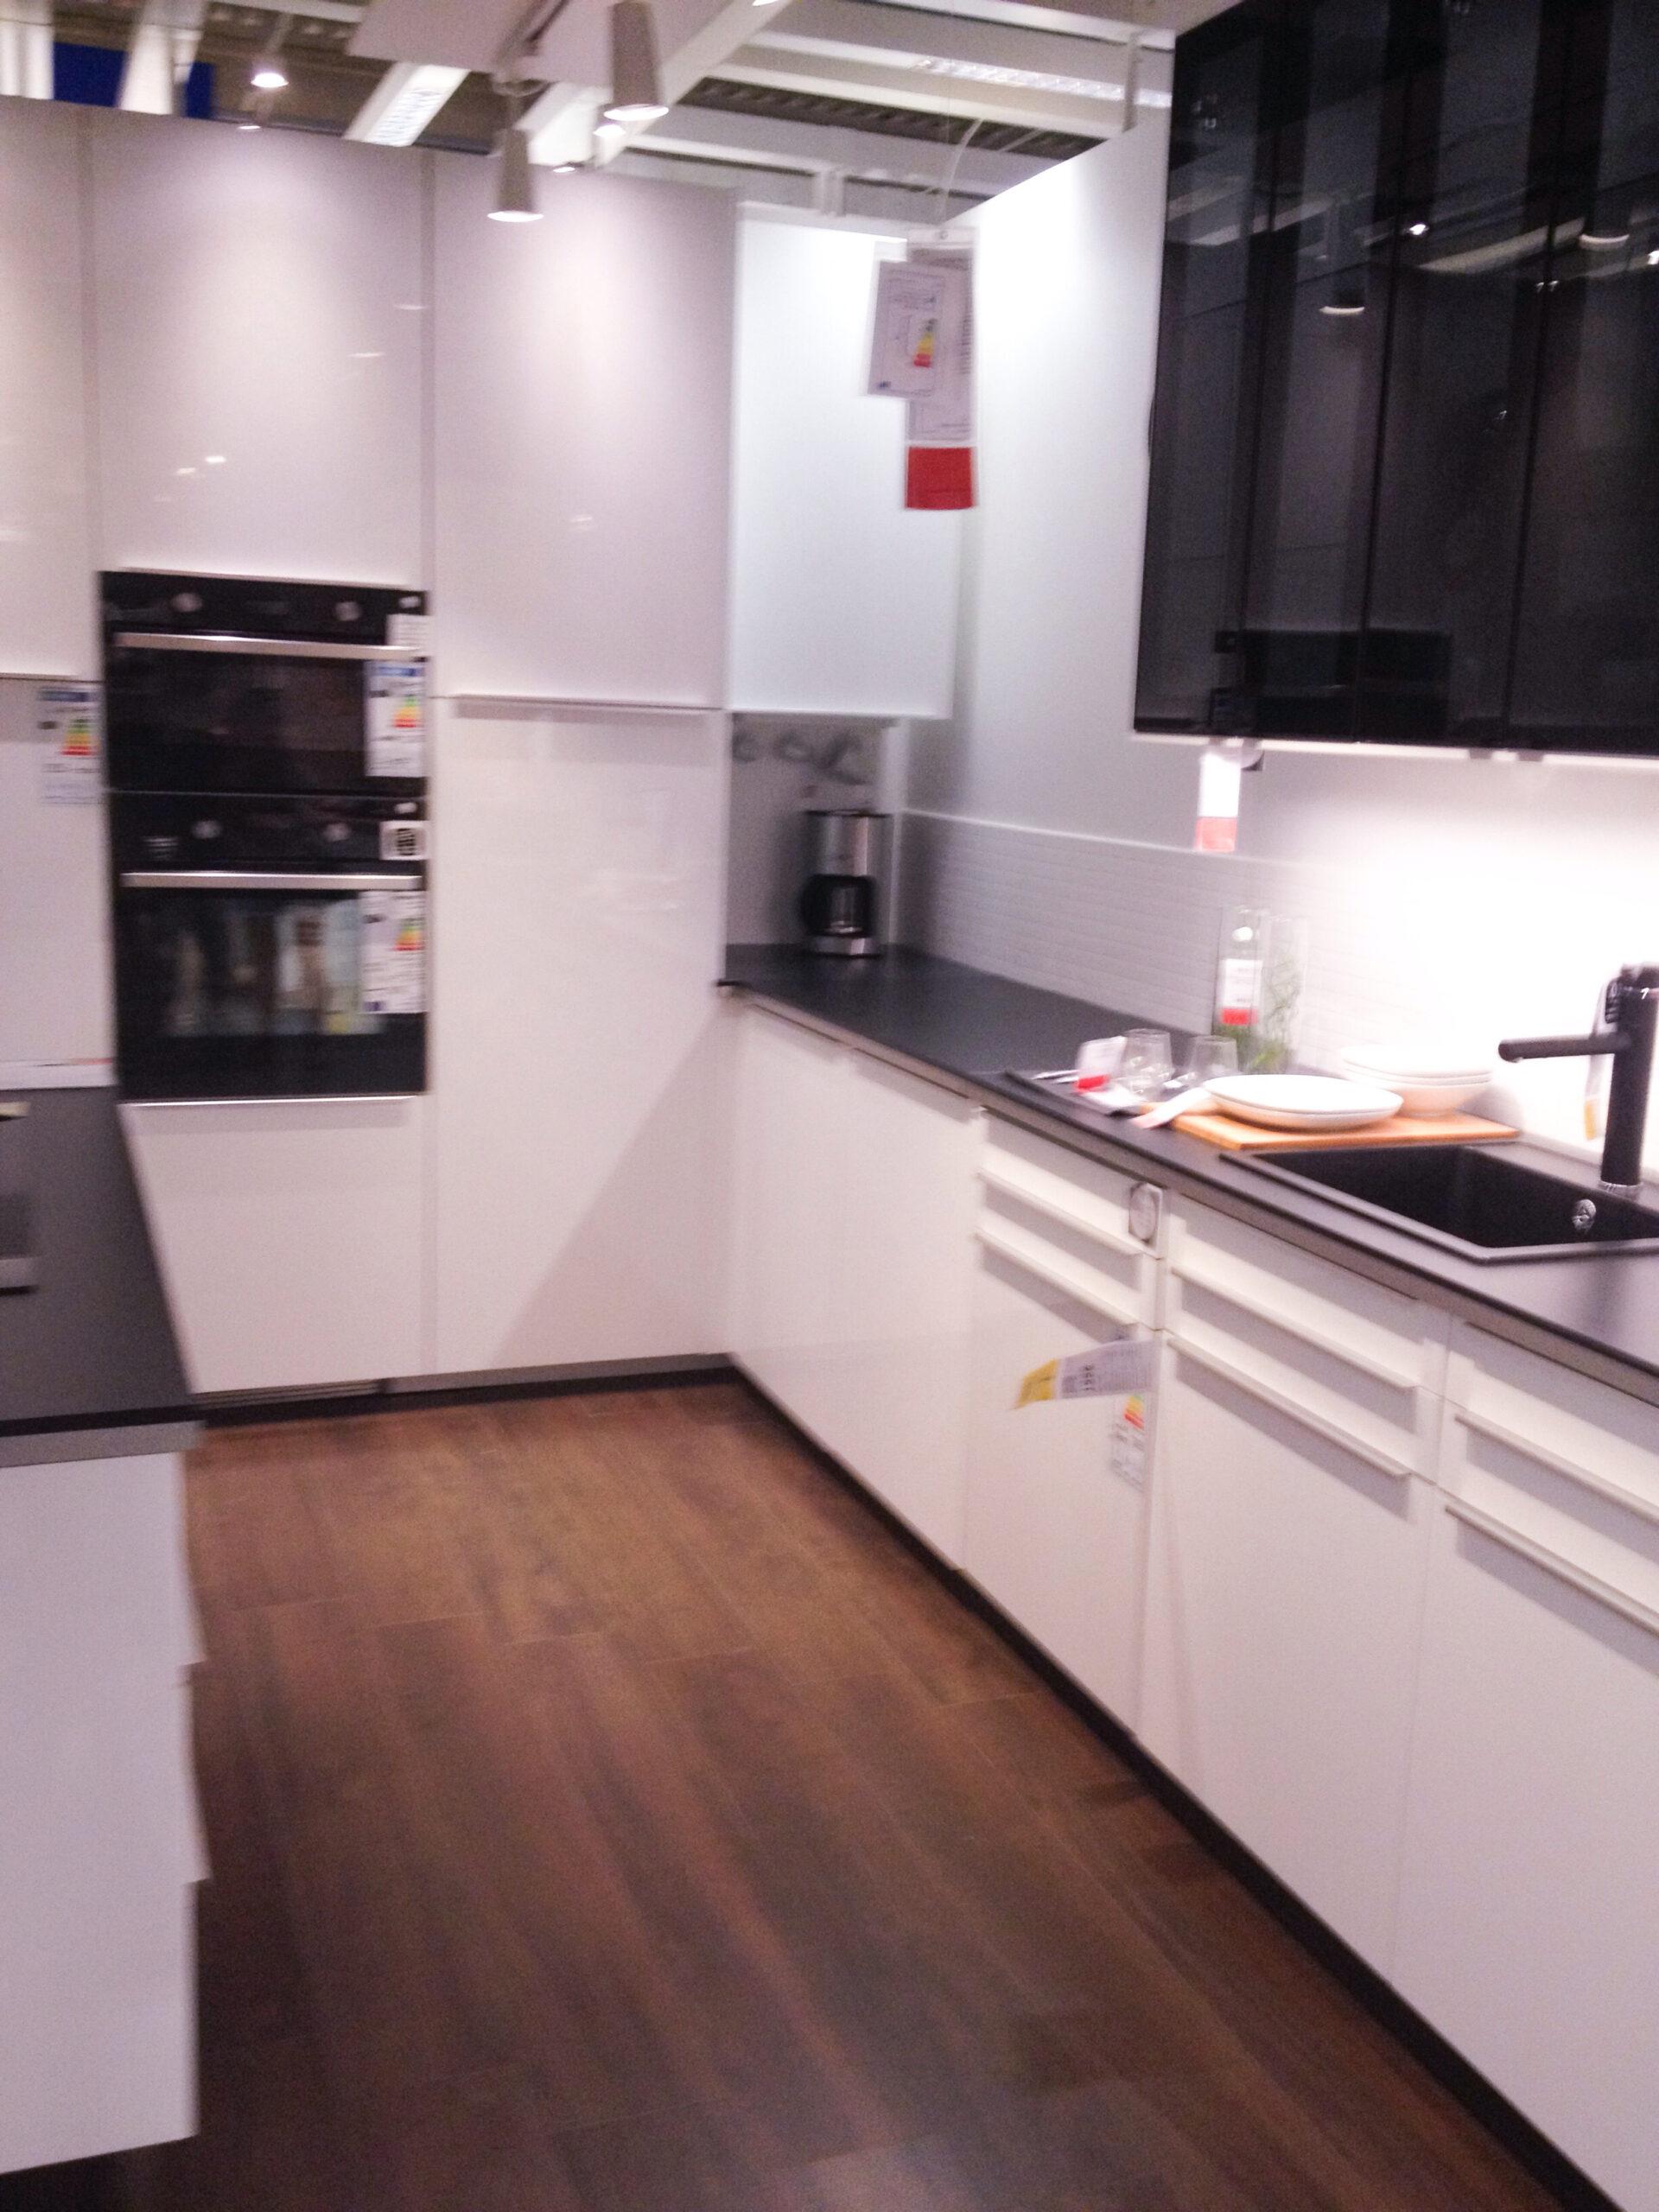 Full Size of Ringhult Ikea Cuisine Units And Appliances All Ekestad Oak Tiles From Küche Kosten Miniküche Kaufen Betten Bei Modulküche 160x200 Sofa Mit Schlaffunktion Wohnzimmer Ringhult Ikea